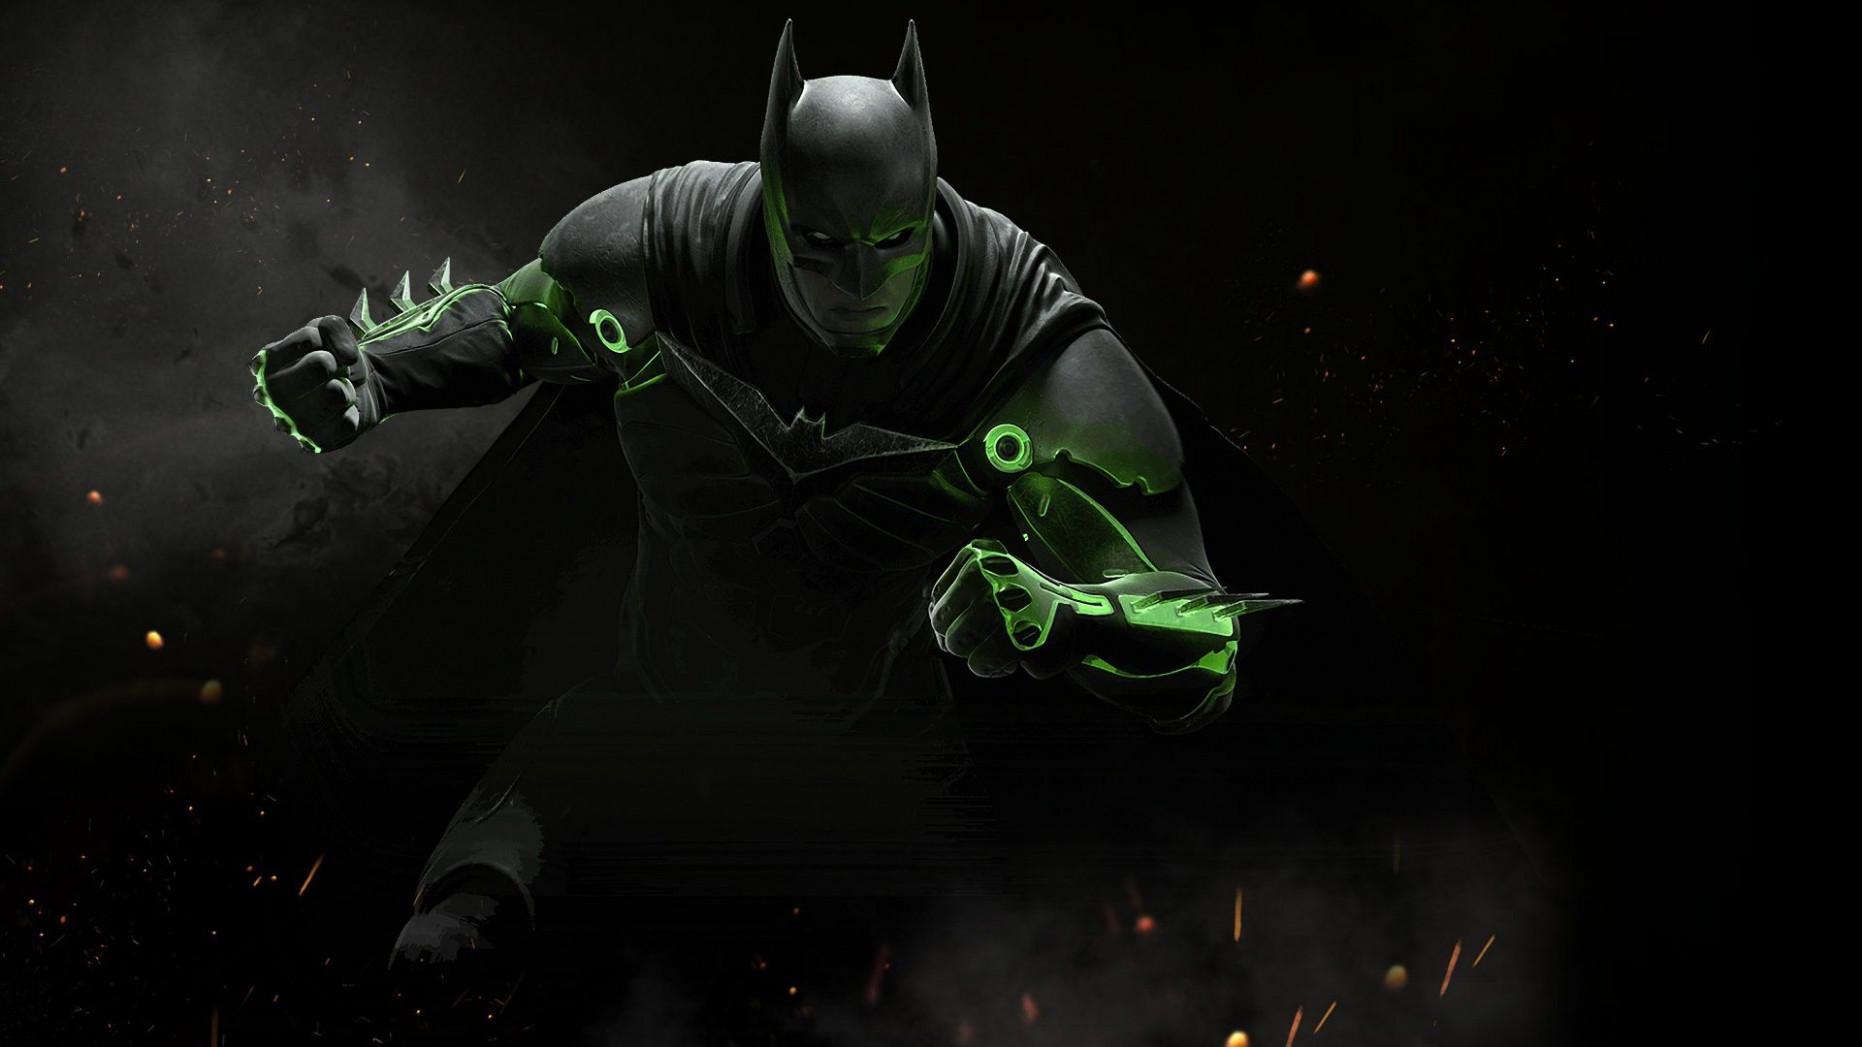 Pin By Hd Wallpapers On Movie Hd Wallpapers In 12 - Injustice 2 Batman Kryptonite Suit - HD Wallpaper